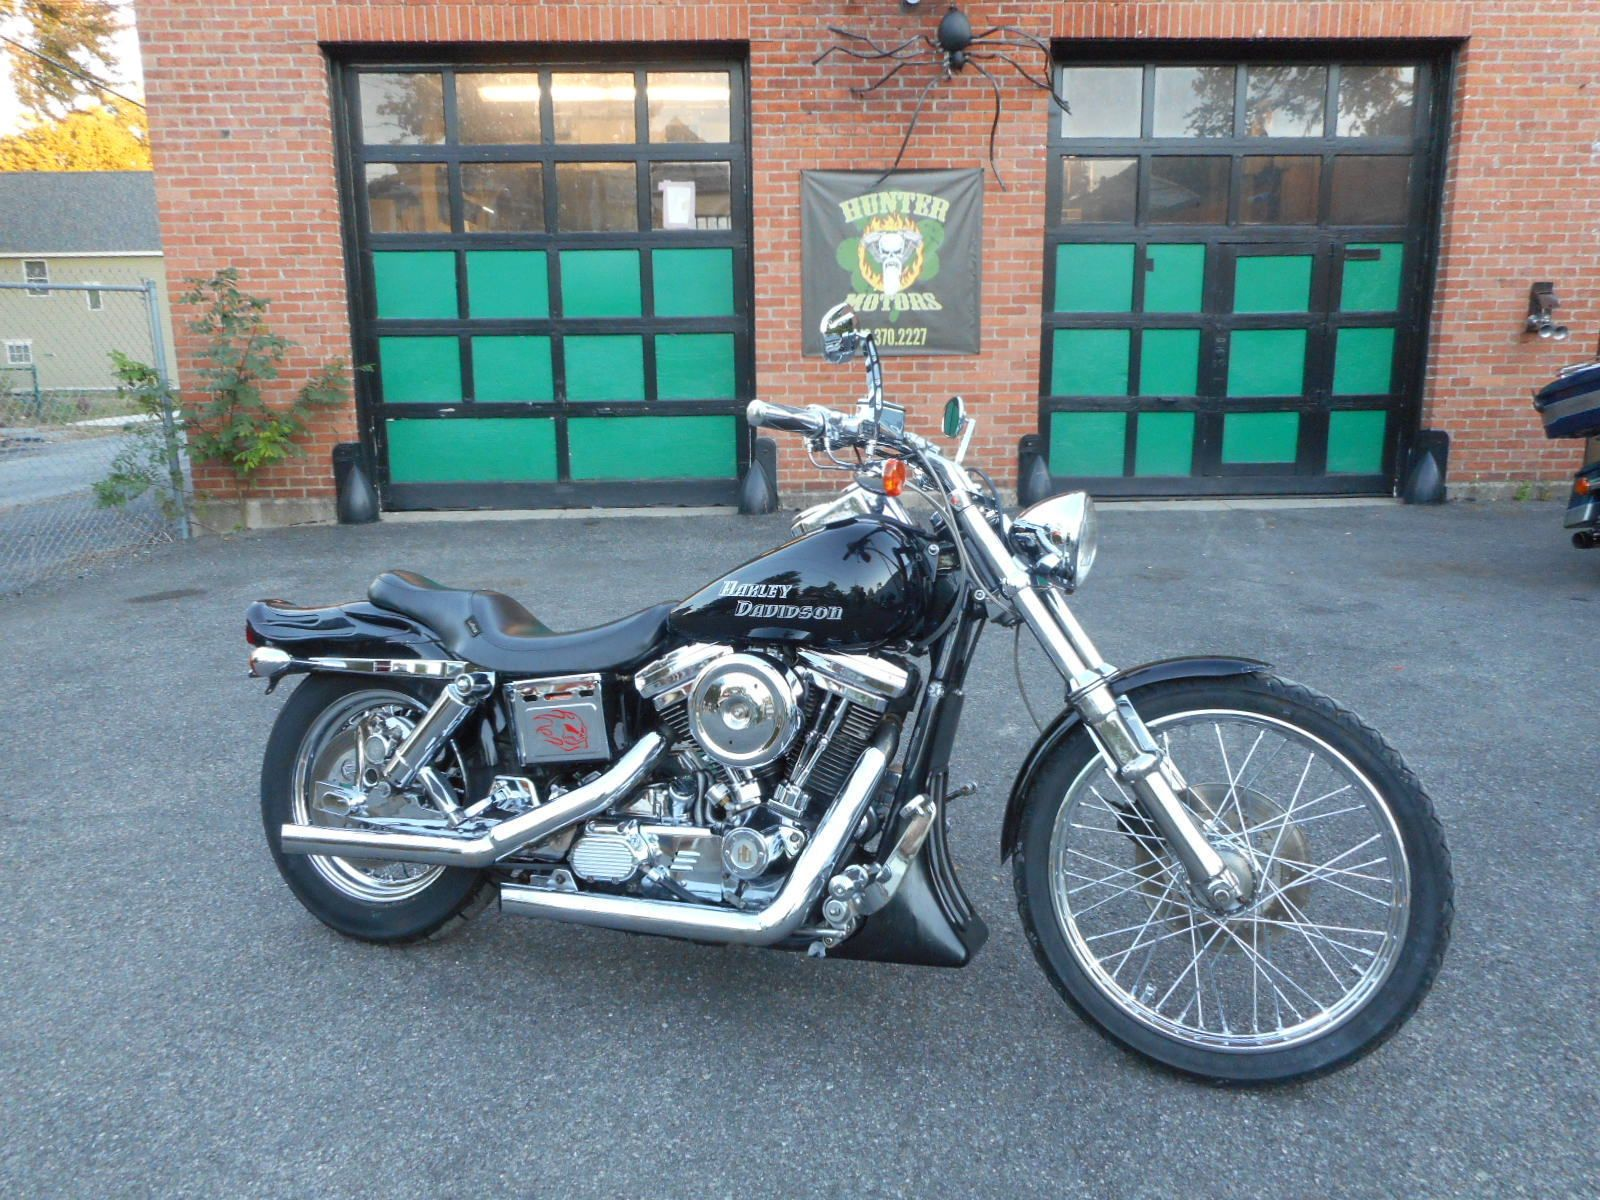 1995 Harley-Davidson Dyna   Harley FXDWG   Pinterest